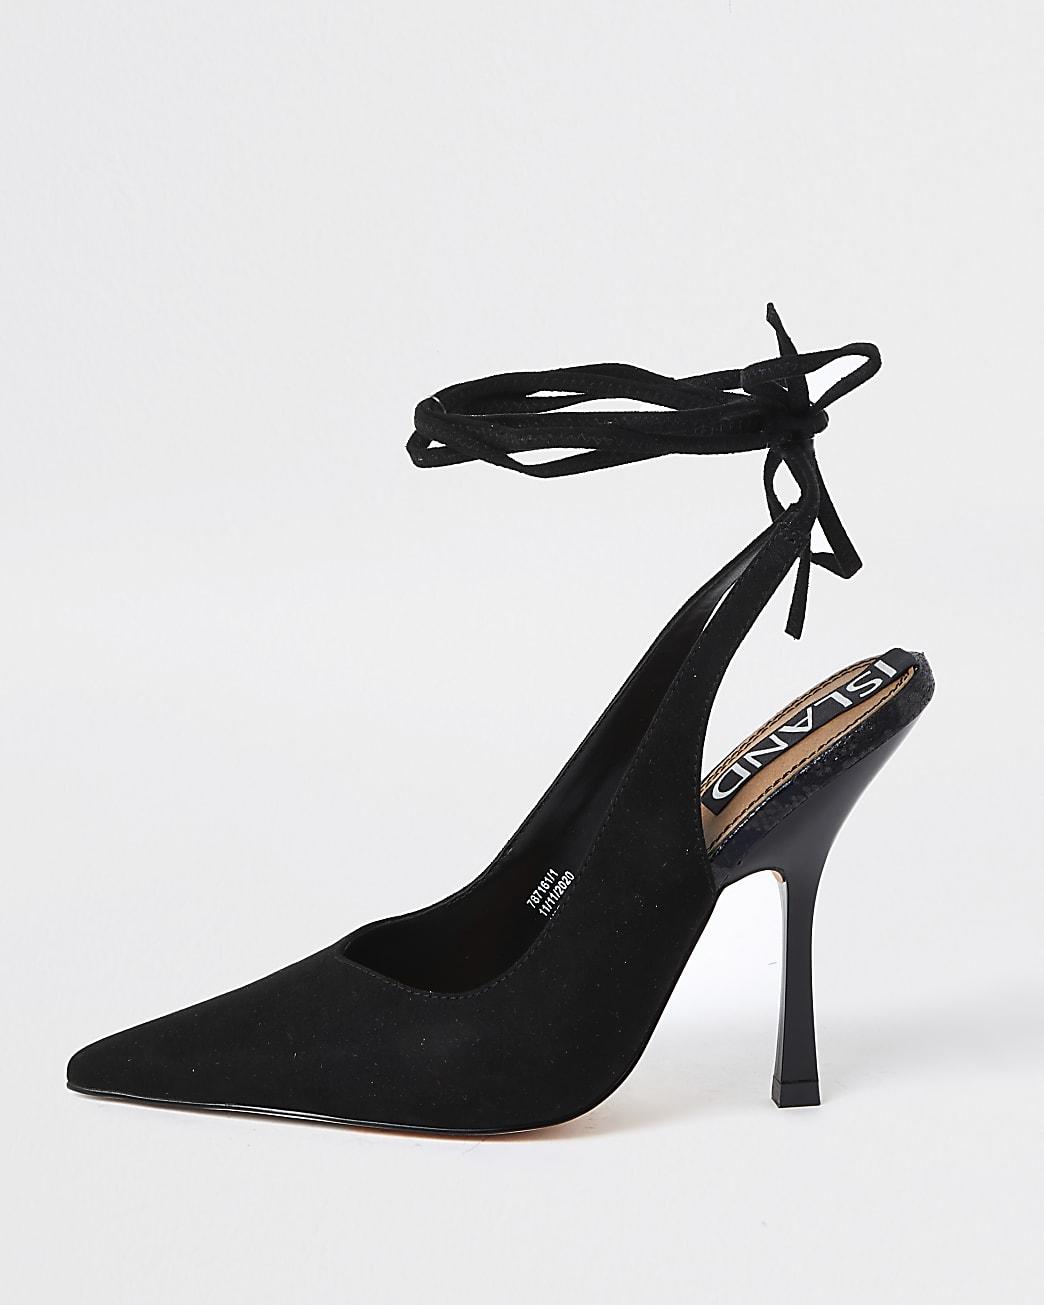 Black ankle tie court heels